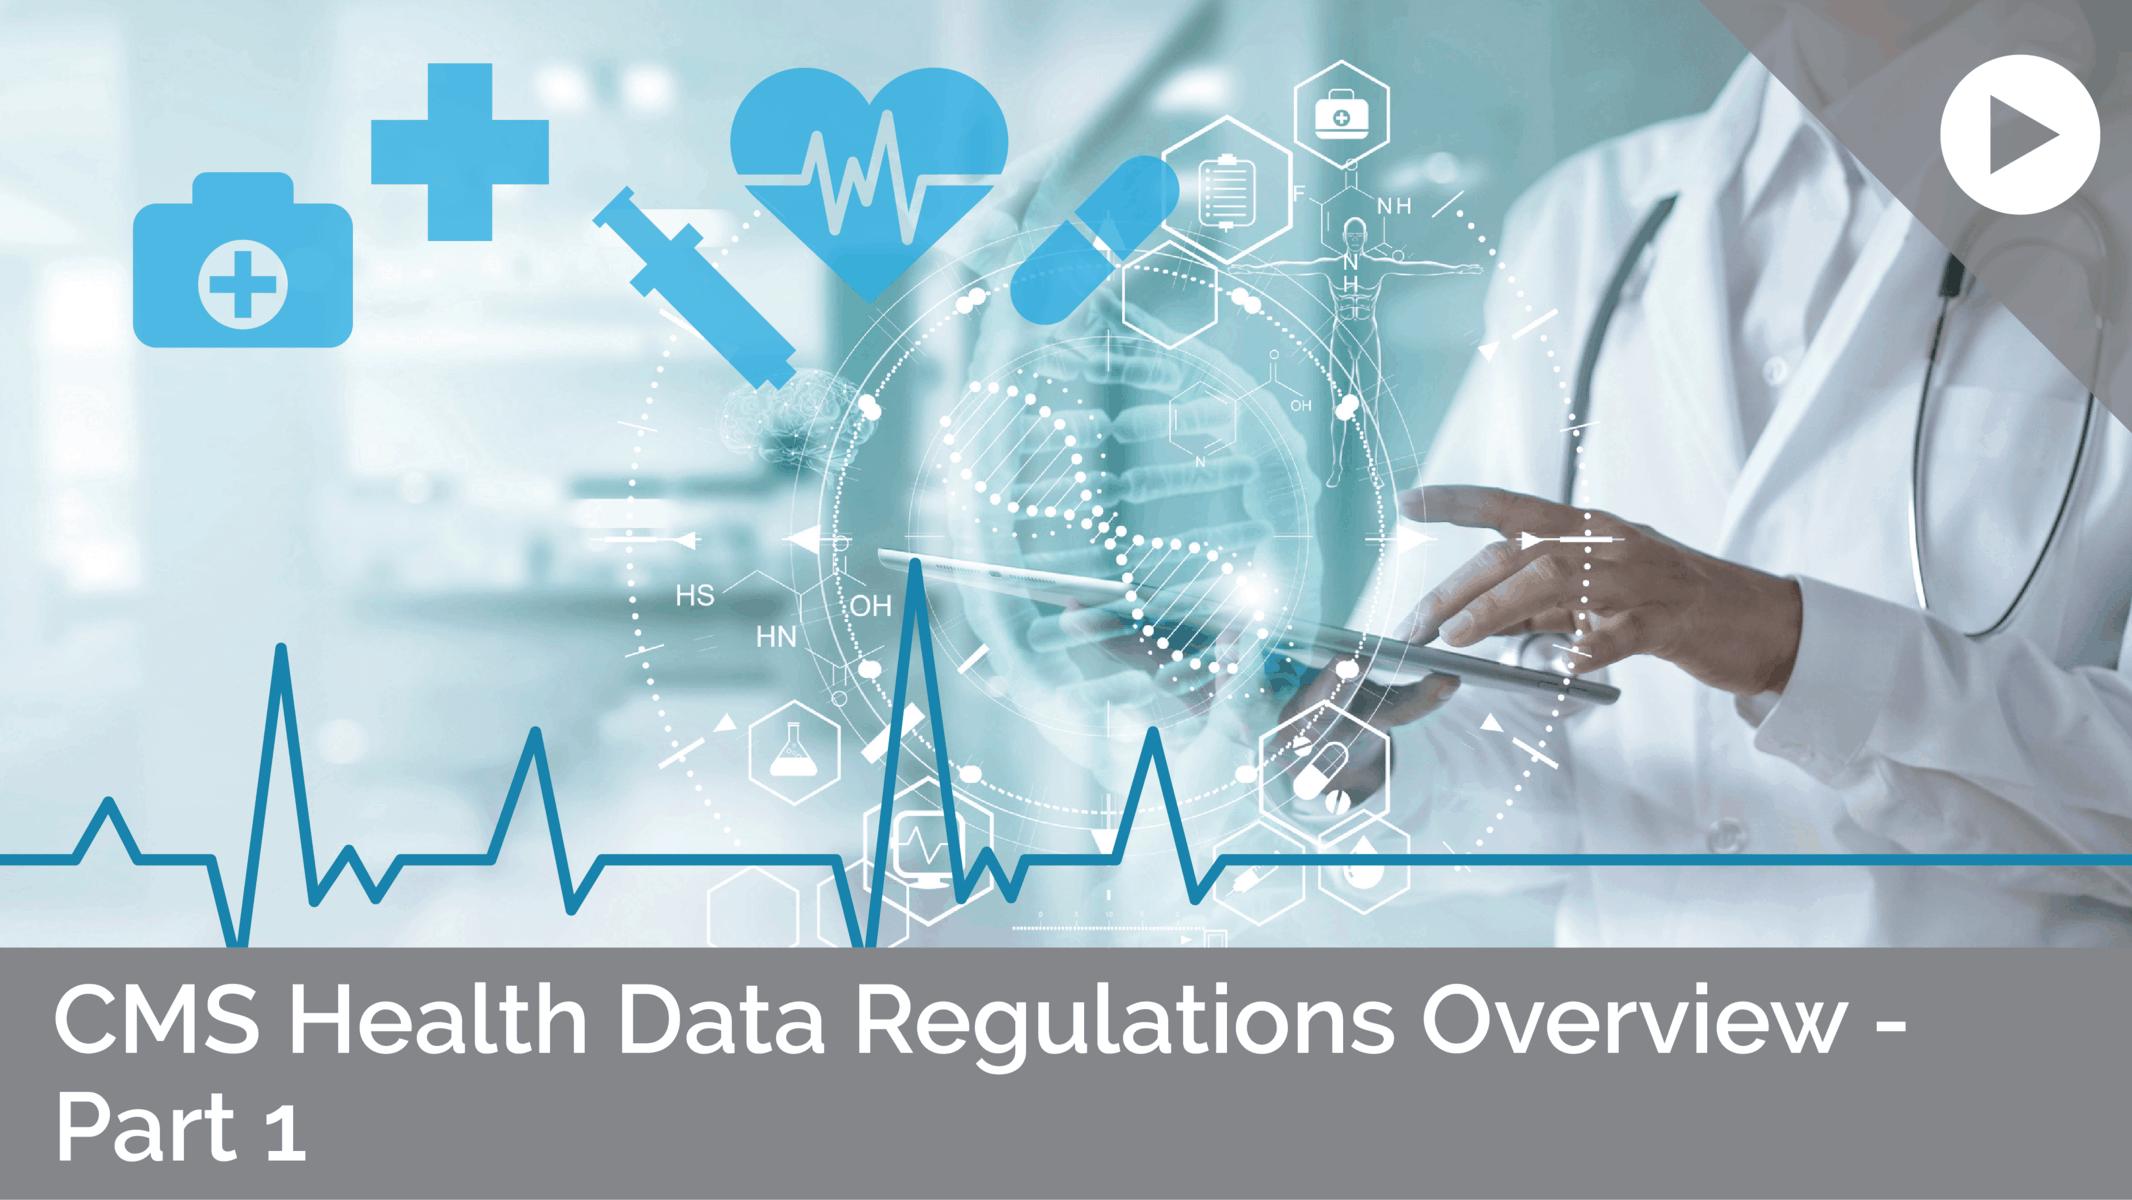 CMS Health Data Regulations Overview - Part 1